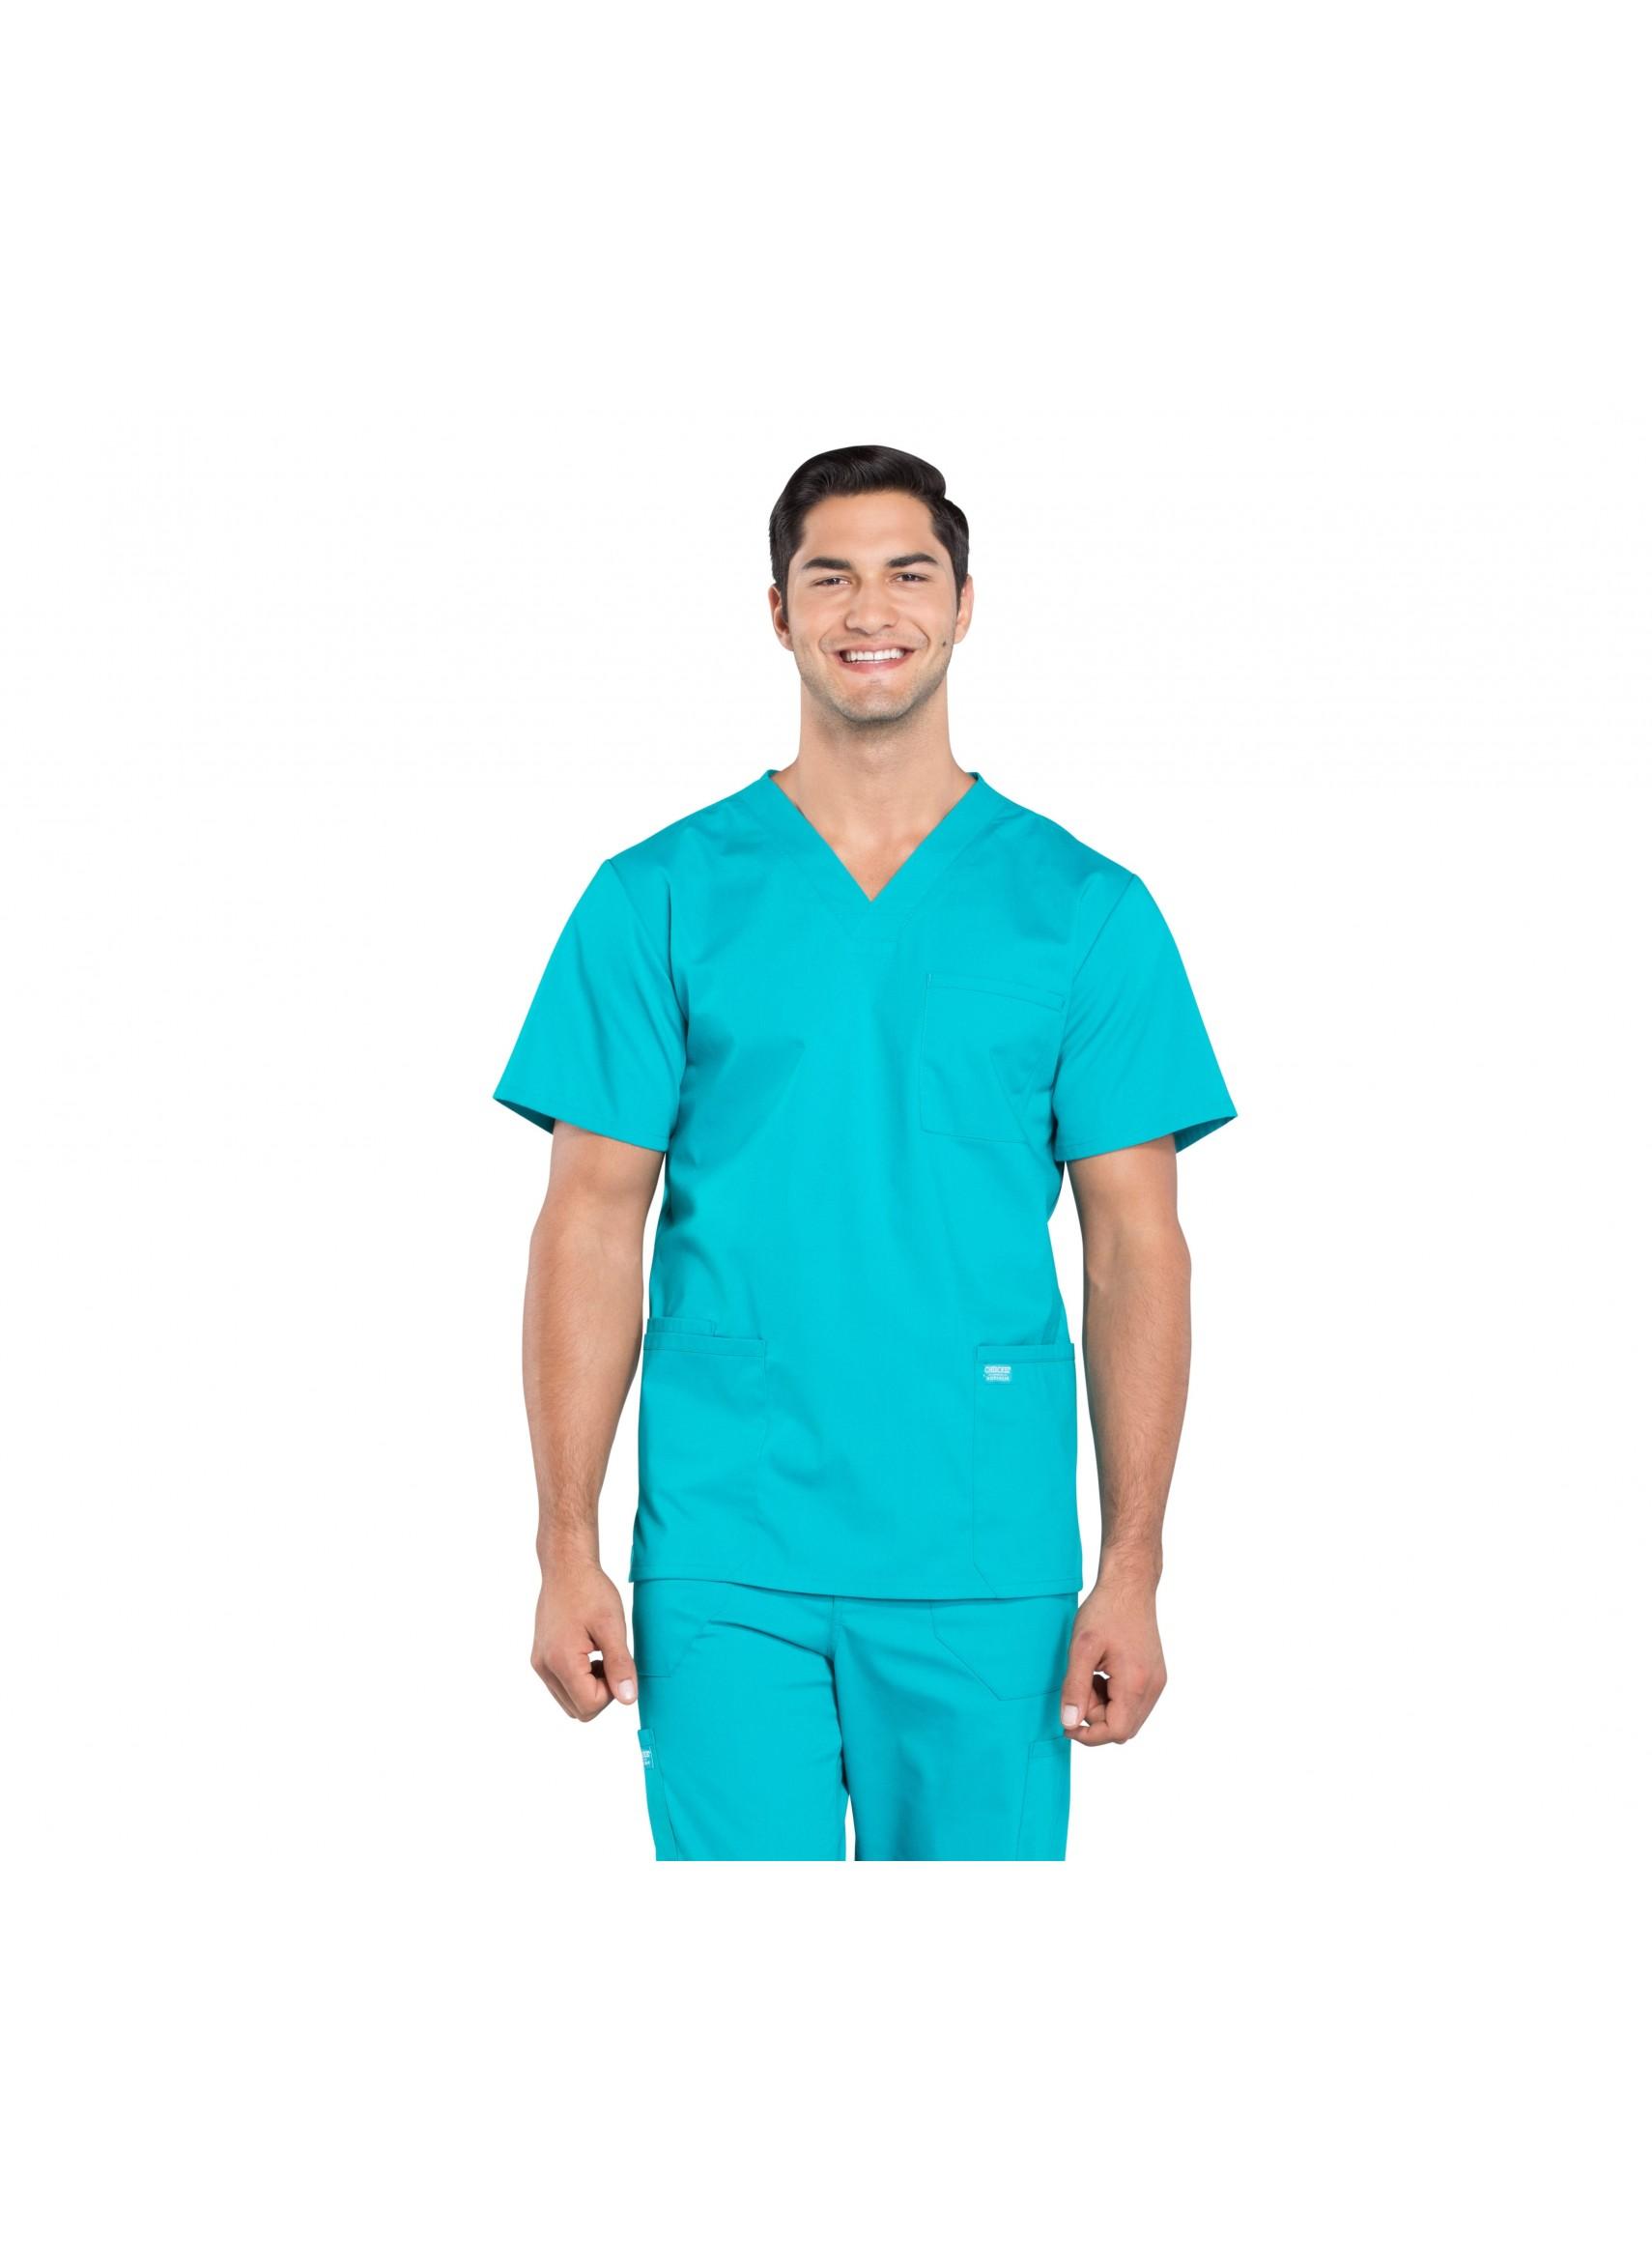 CHEROKEE Workwear Professionals Mens V-Neck Scrub Top